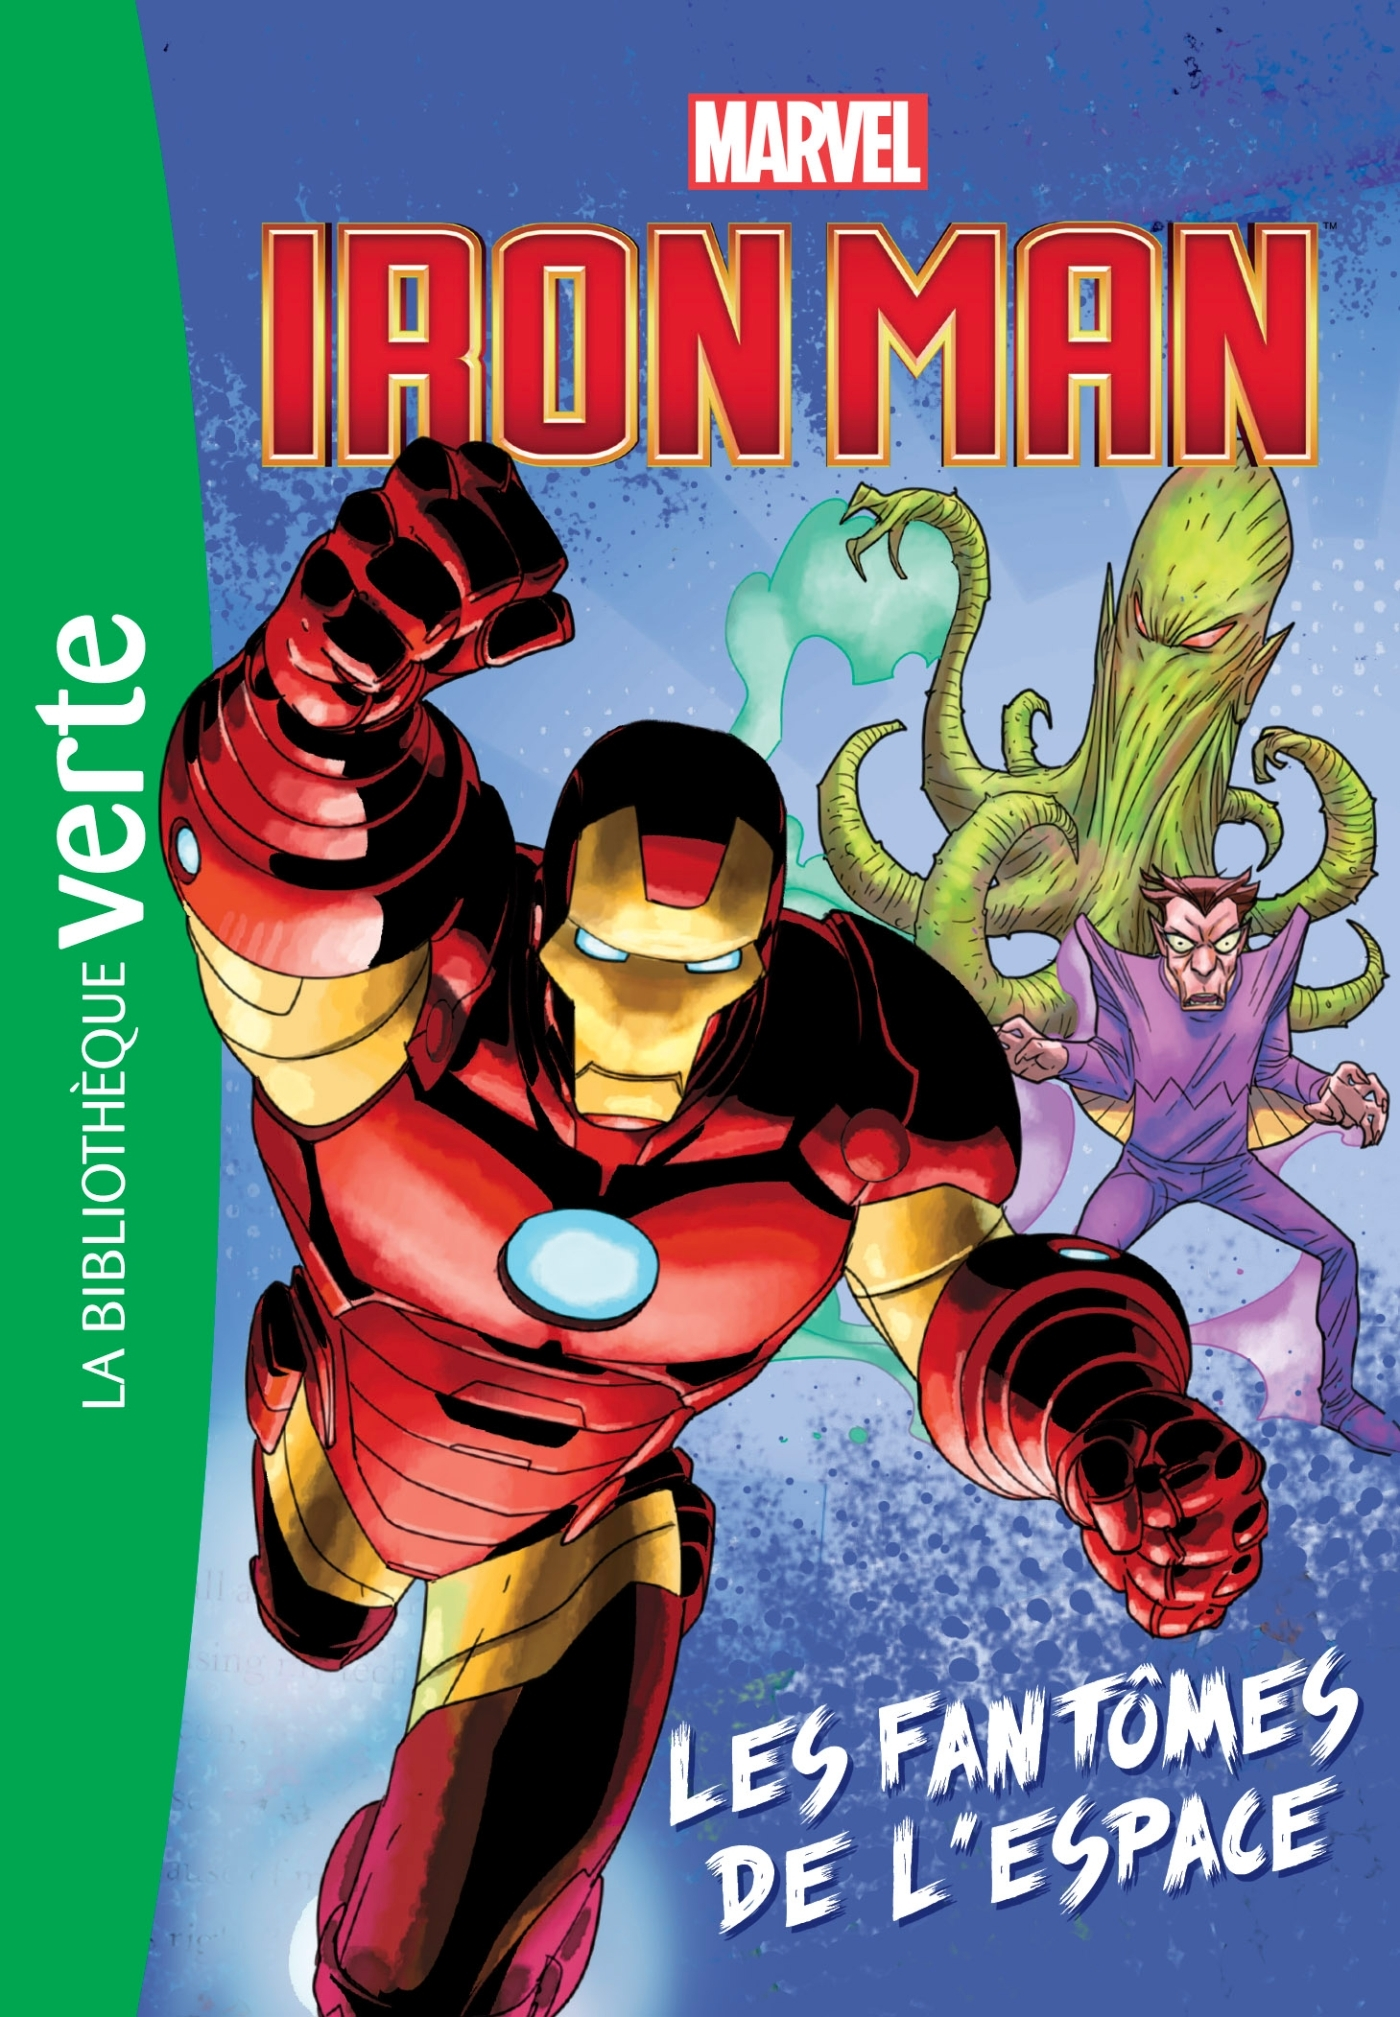 HEROS MARVEL 02 - IRON MAN, LES FANTOMES DE L'ESPACE